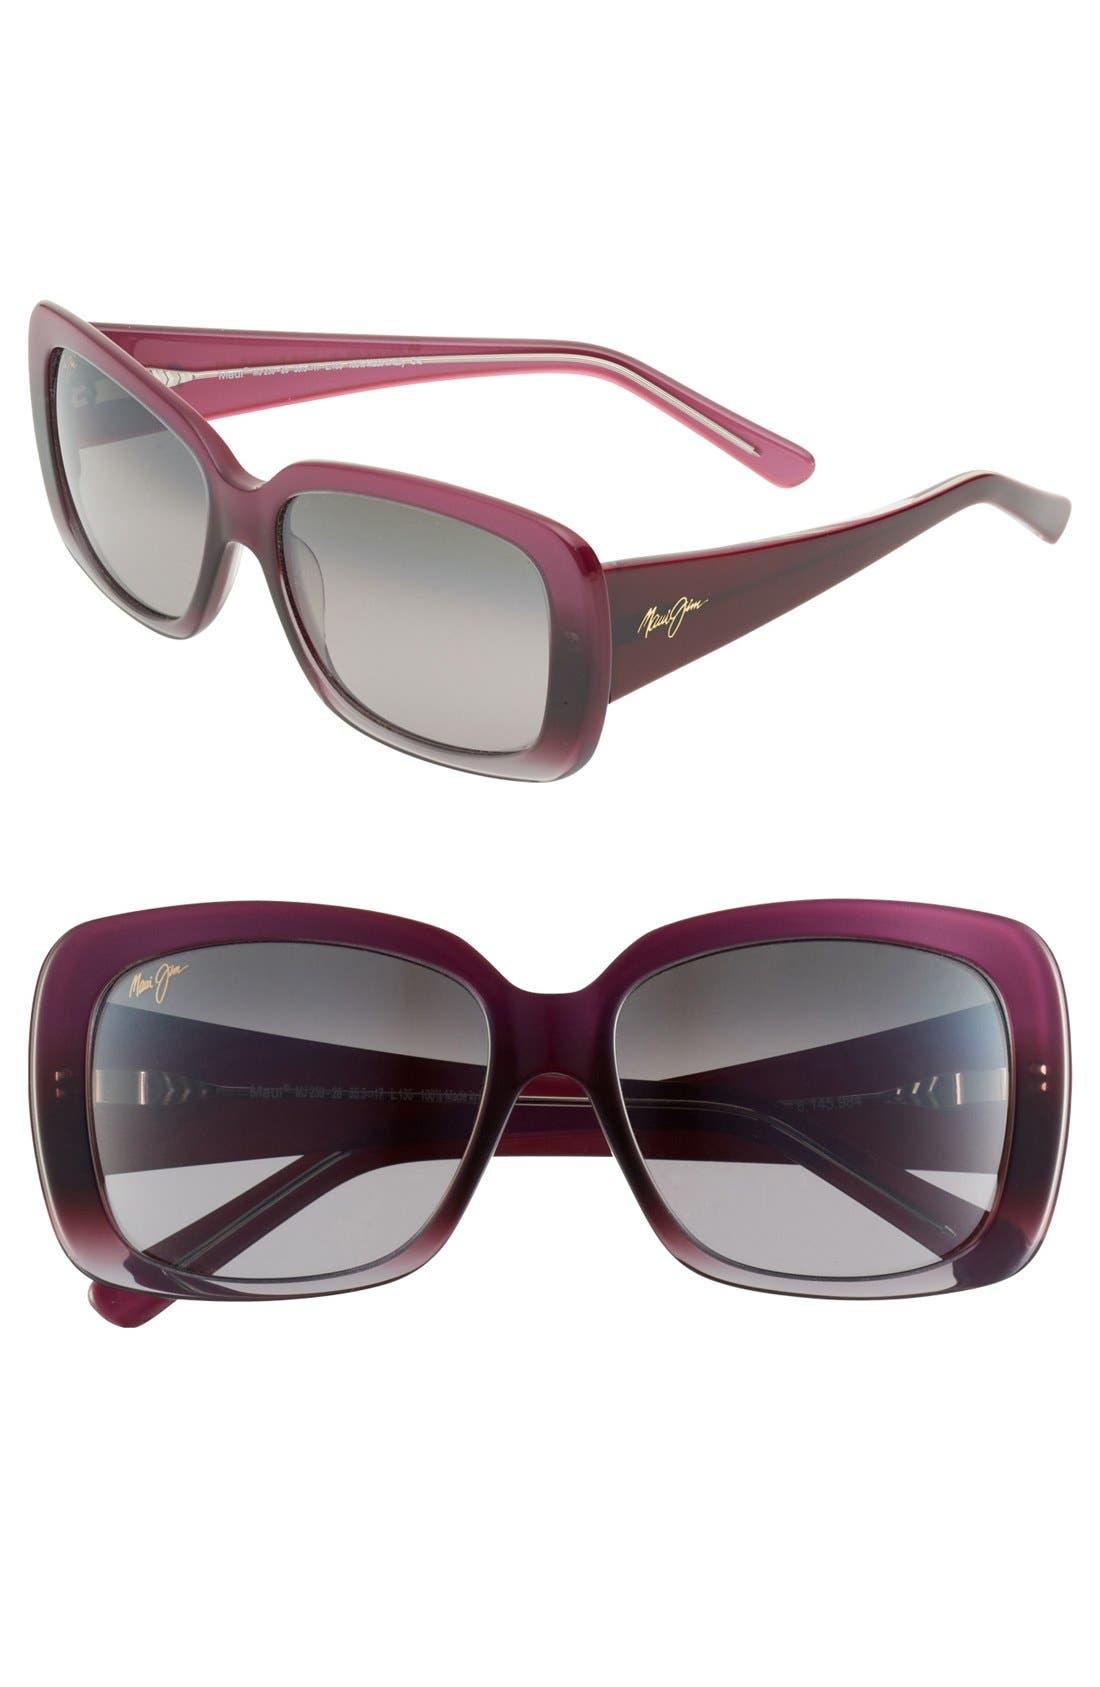 Main Image - Maui Jim 'Lani' 56mm Oversized Sunglasses